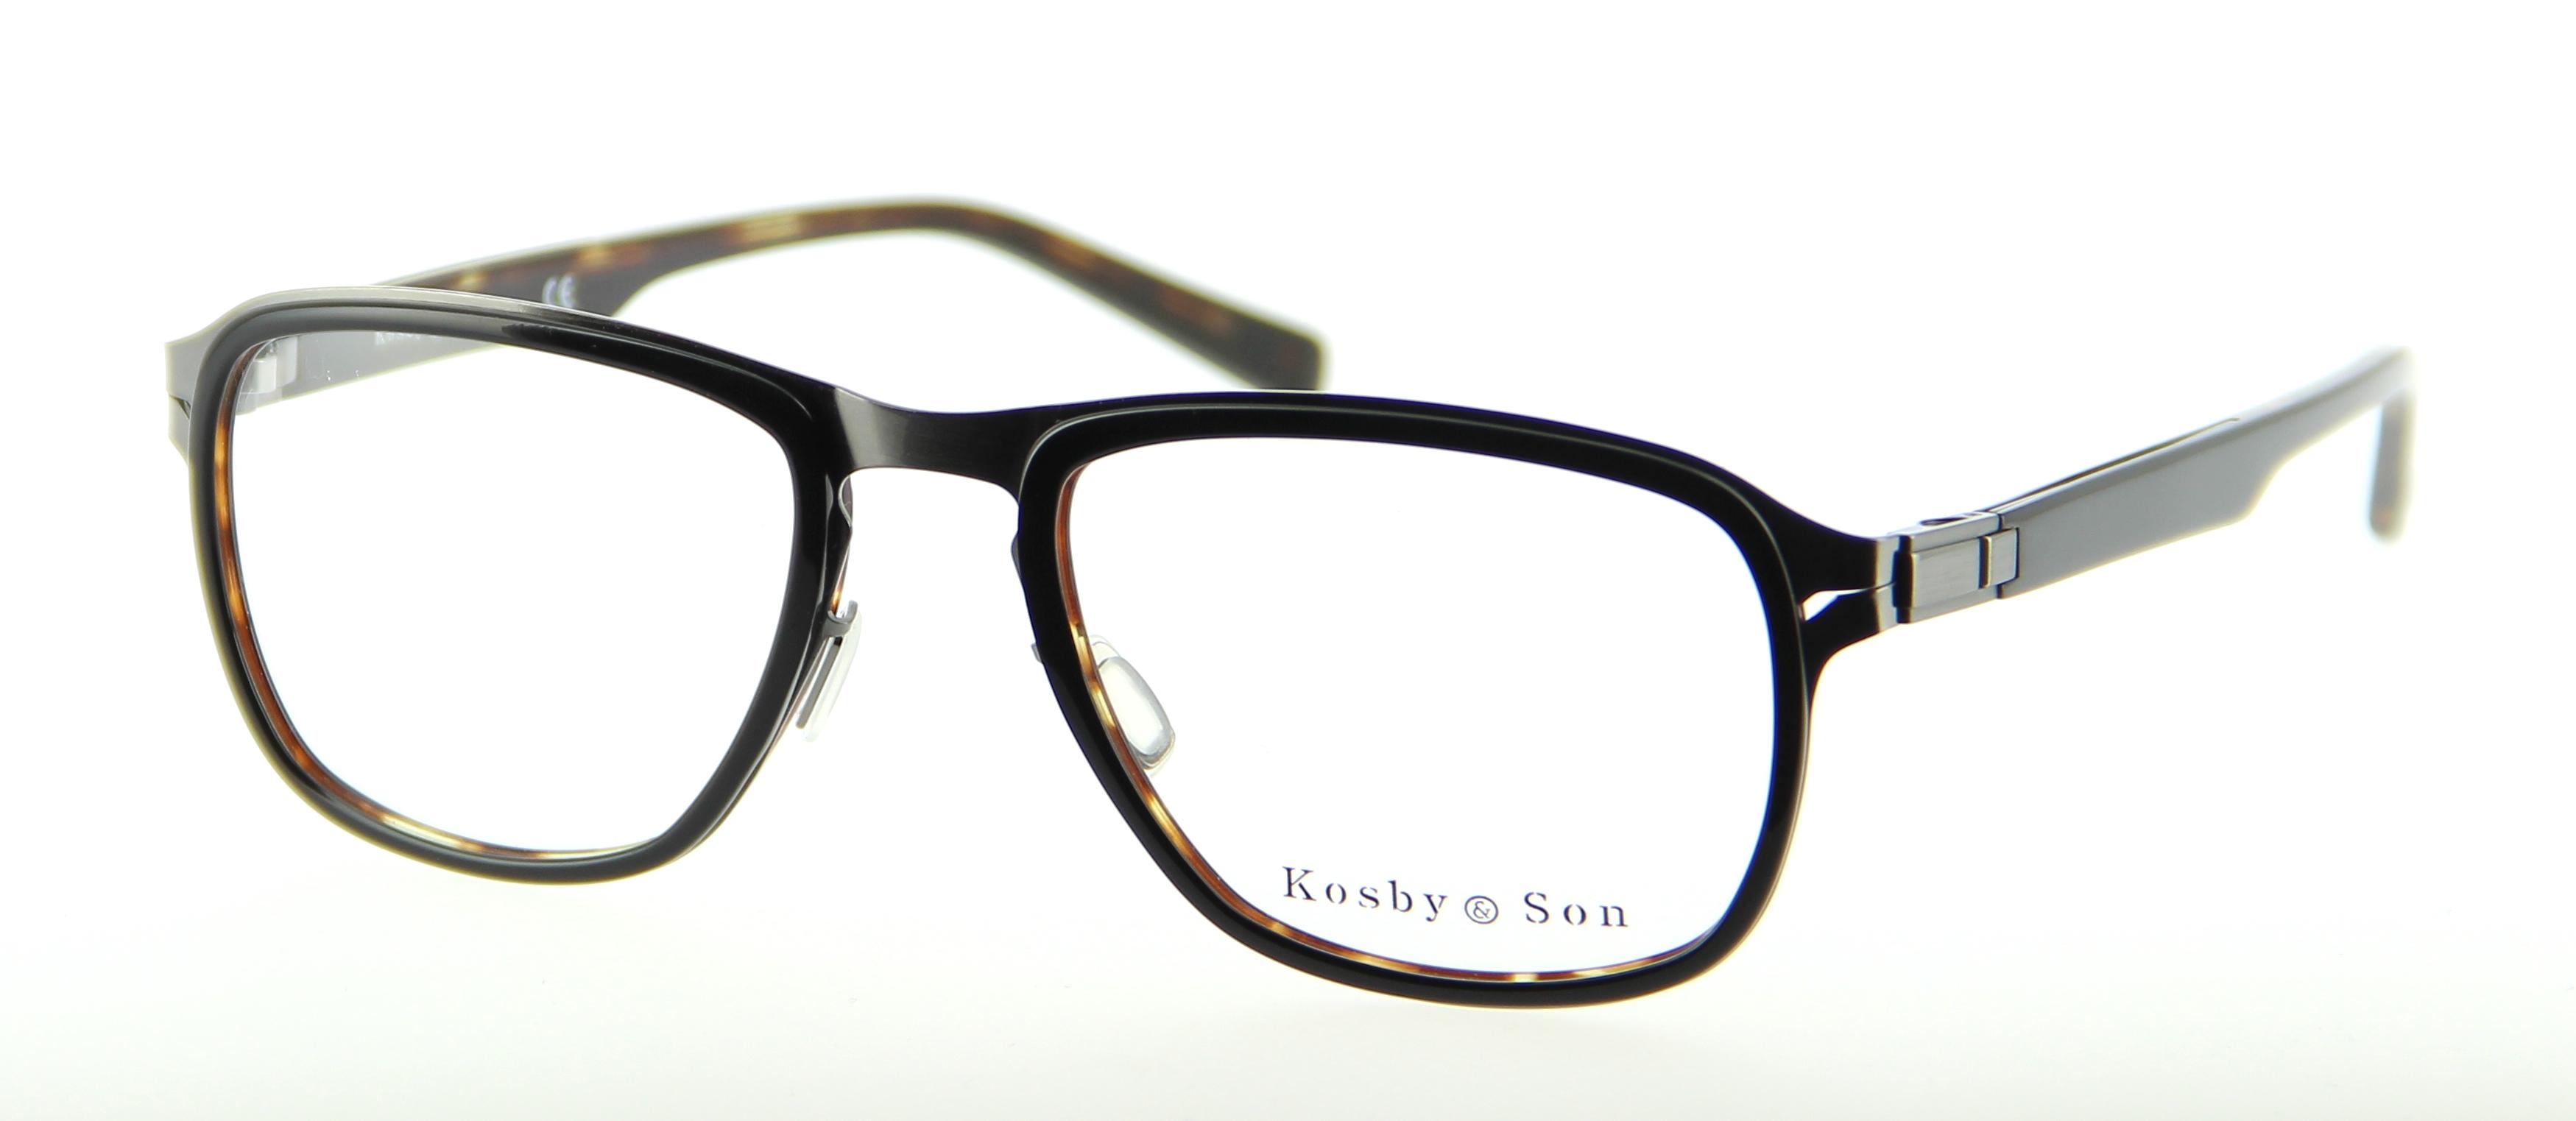 Eyeglasses KOSBY & SON KS BONDI NOEC 53/19 Woman NOIR ...